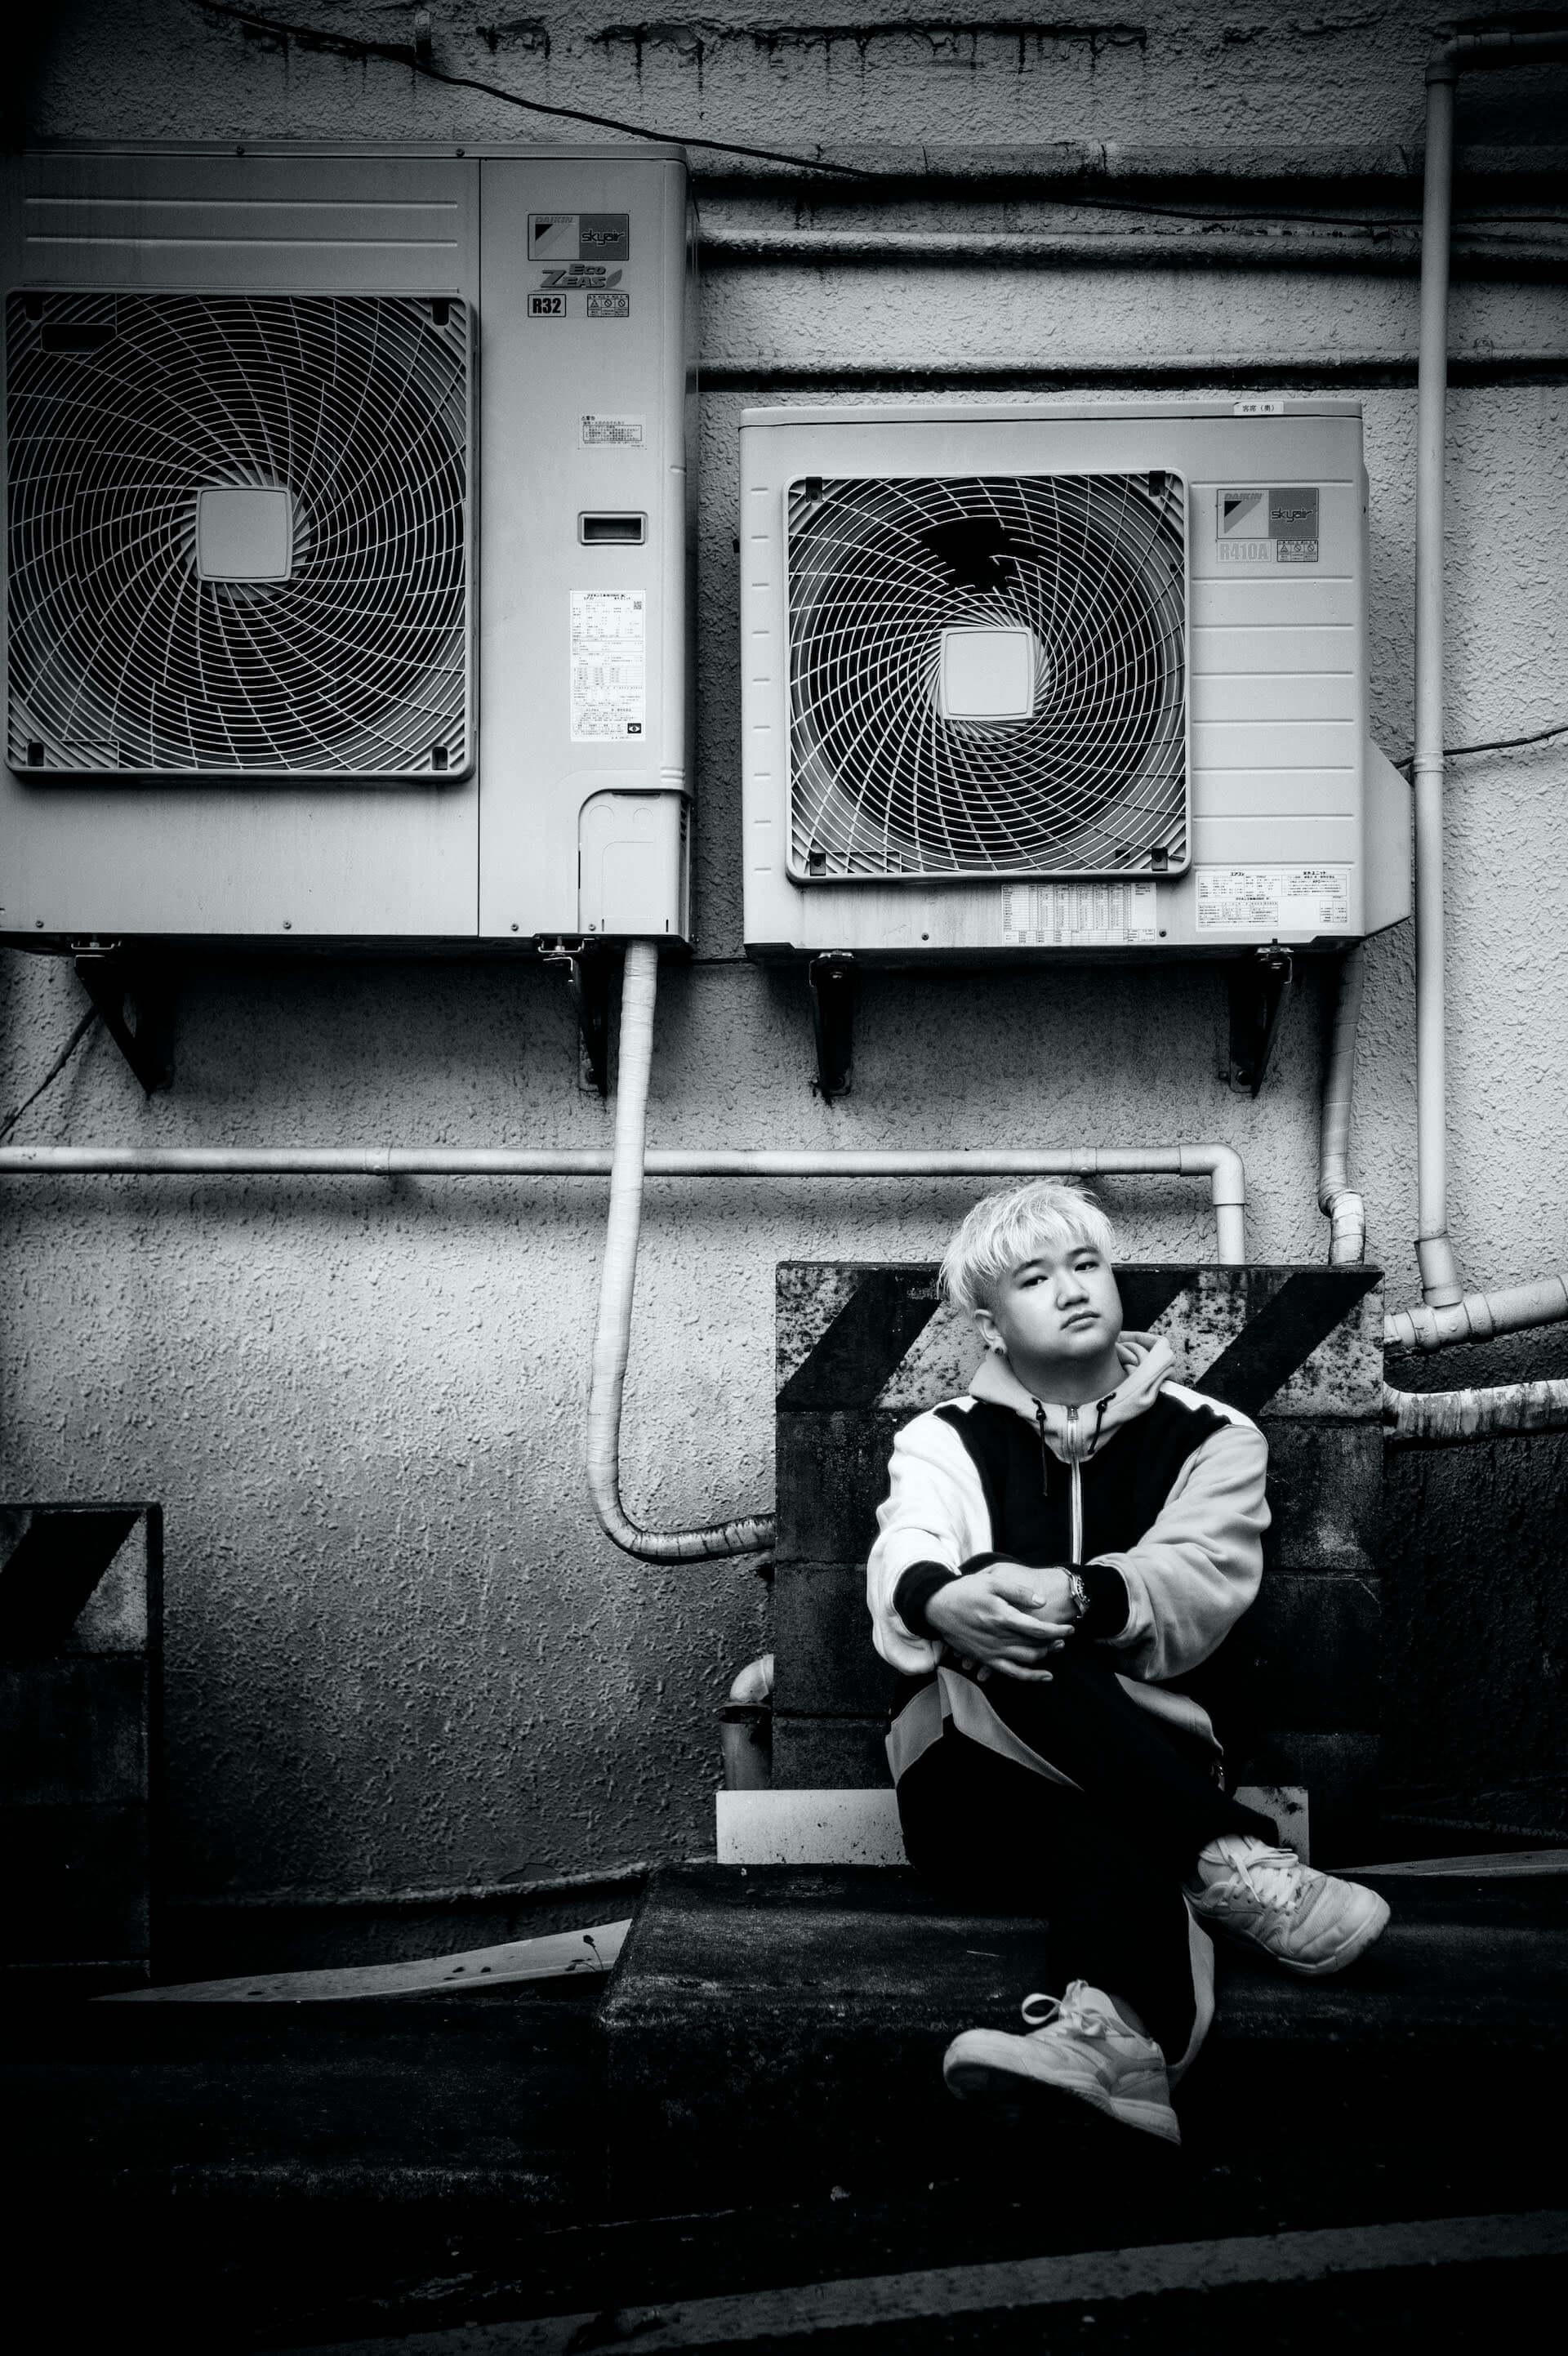 Yaffleが1stアルバム『Lost, Never Gone』とリード曲MVを解禁!高岩遼、iri、SIRUP、OKAMOTO'Sら7組のコメントも到着 music200918_yaffle_1-1920x2885